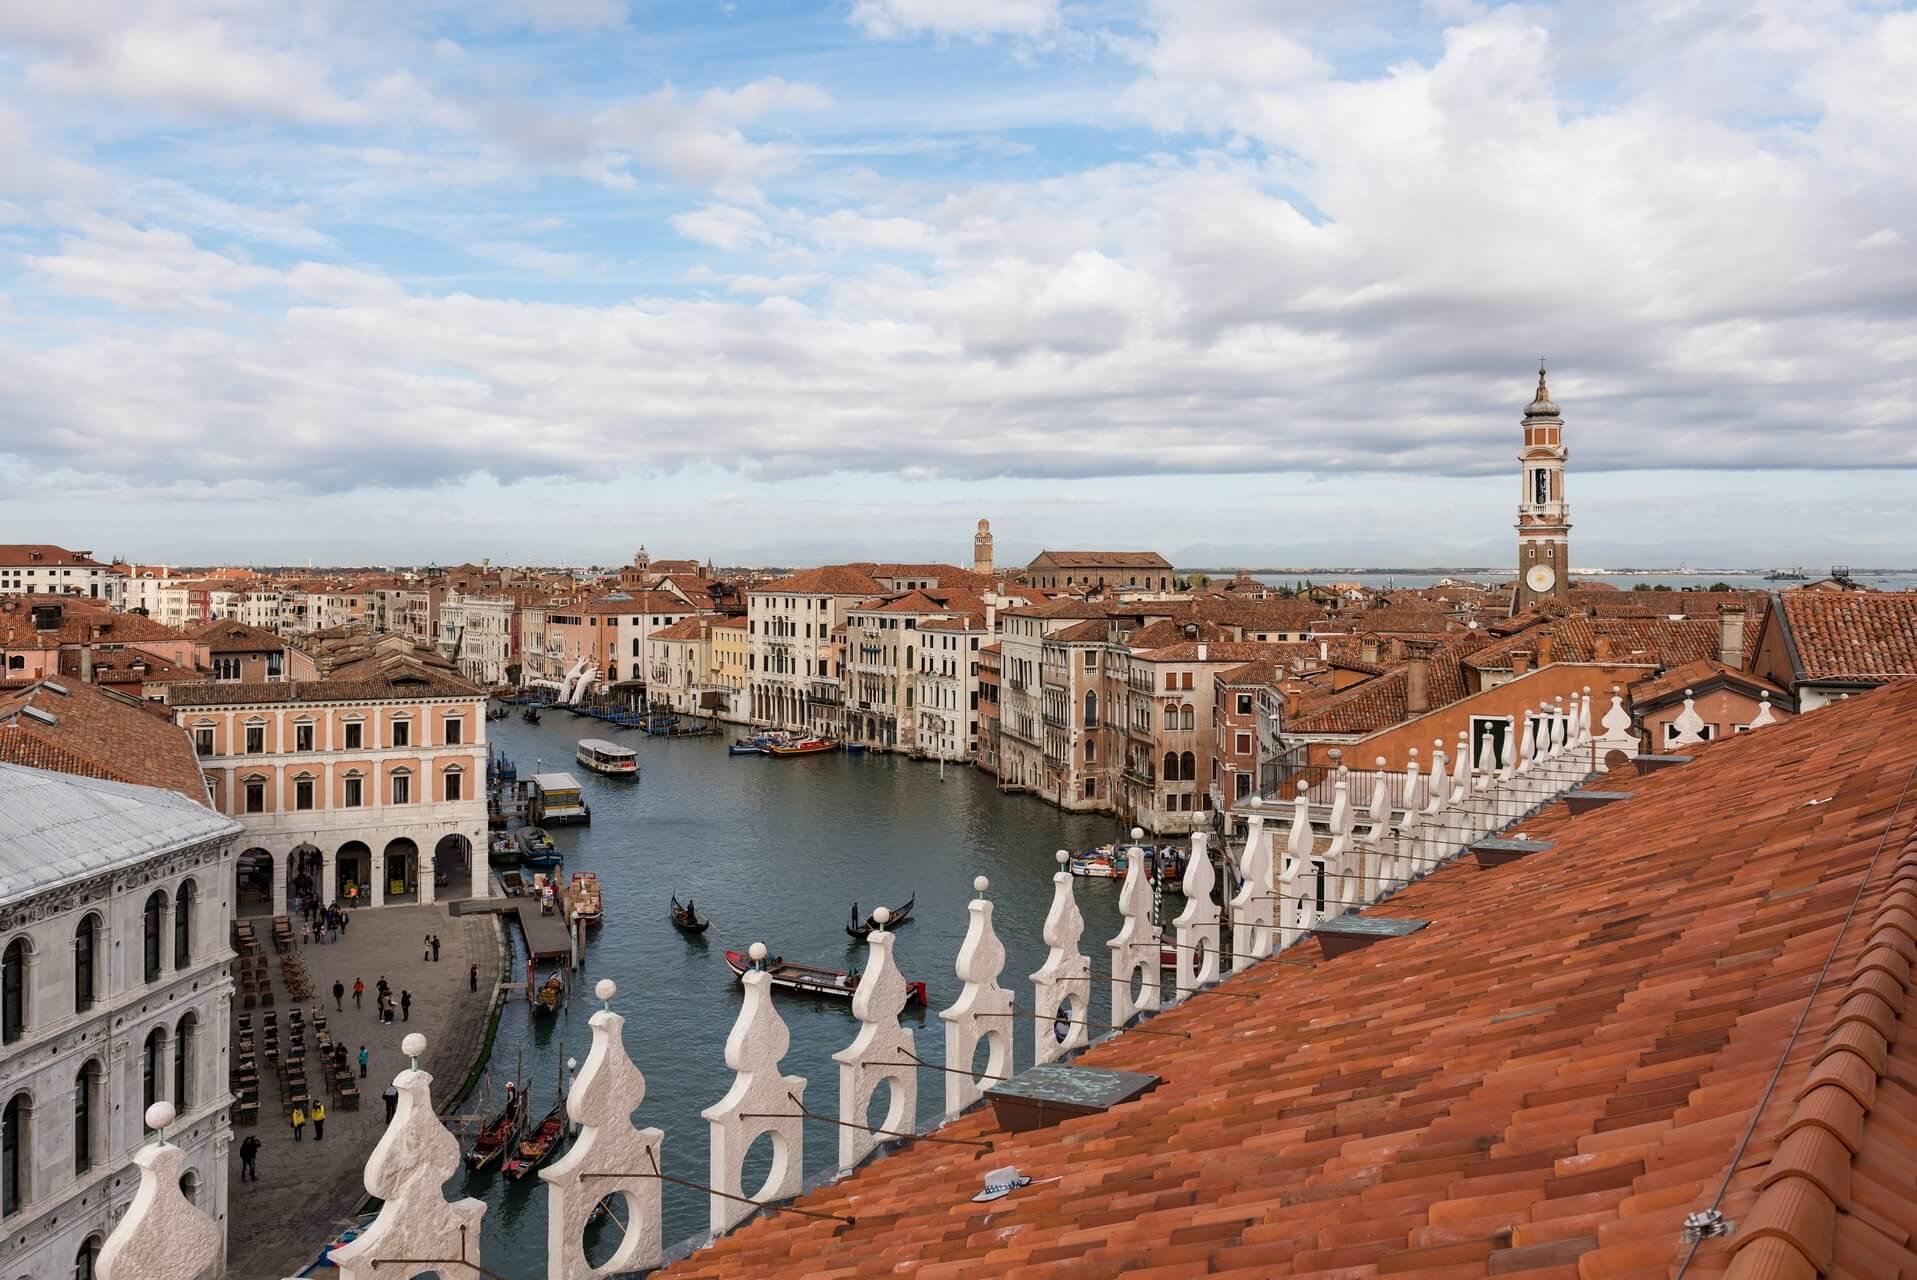 Italien: Venedig Italiy: Venice roof top view to Canal Grande, Fotograf: Steffen Lohse